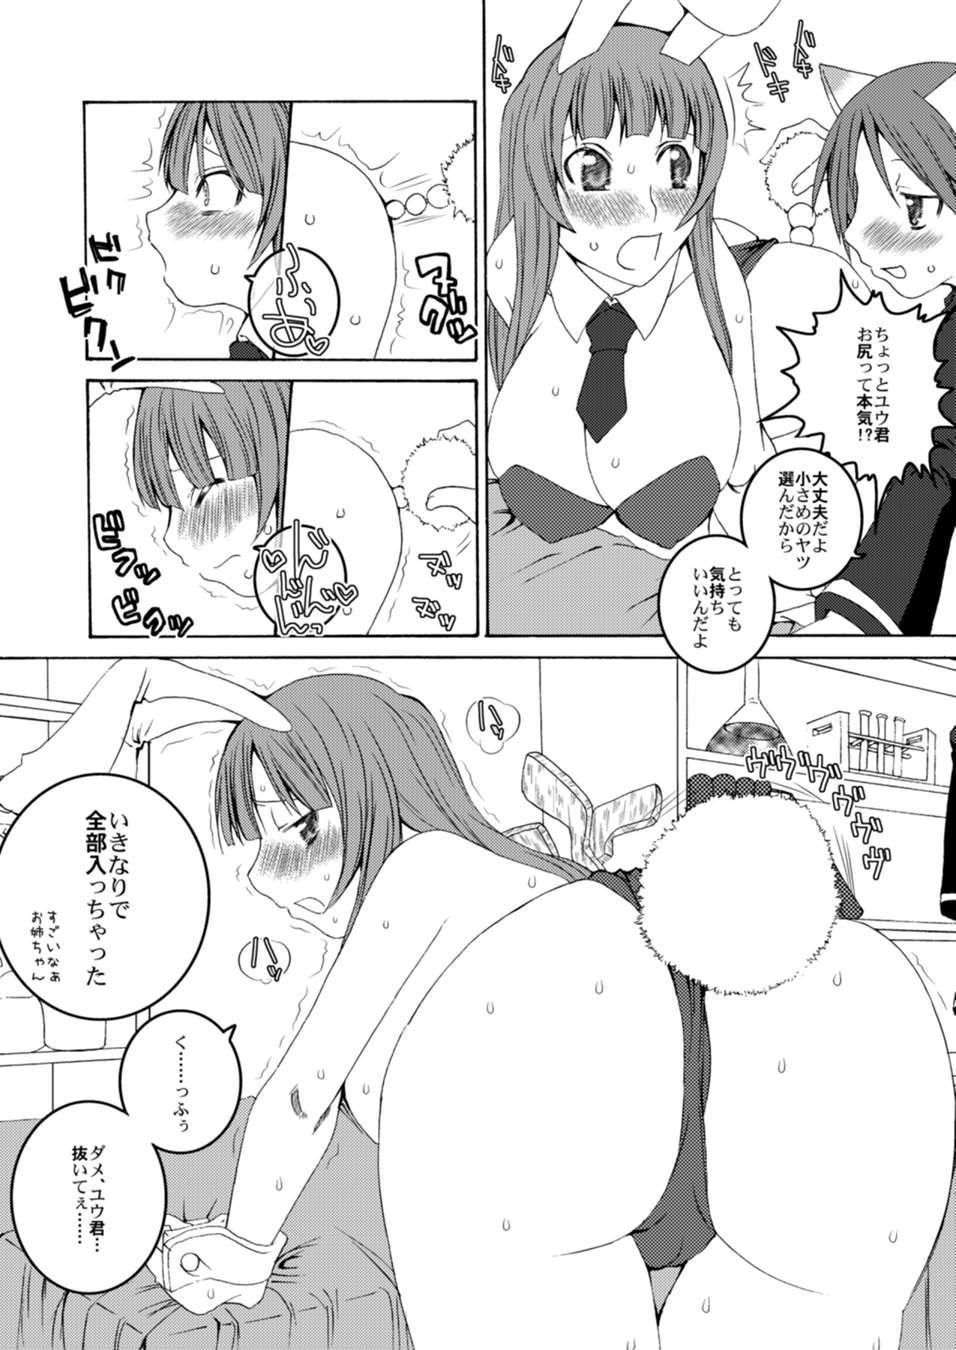 U-REI GIRL SENTIMENTAL FIGHT 8